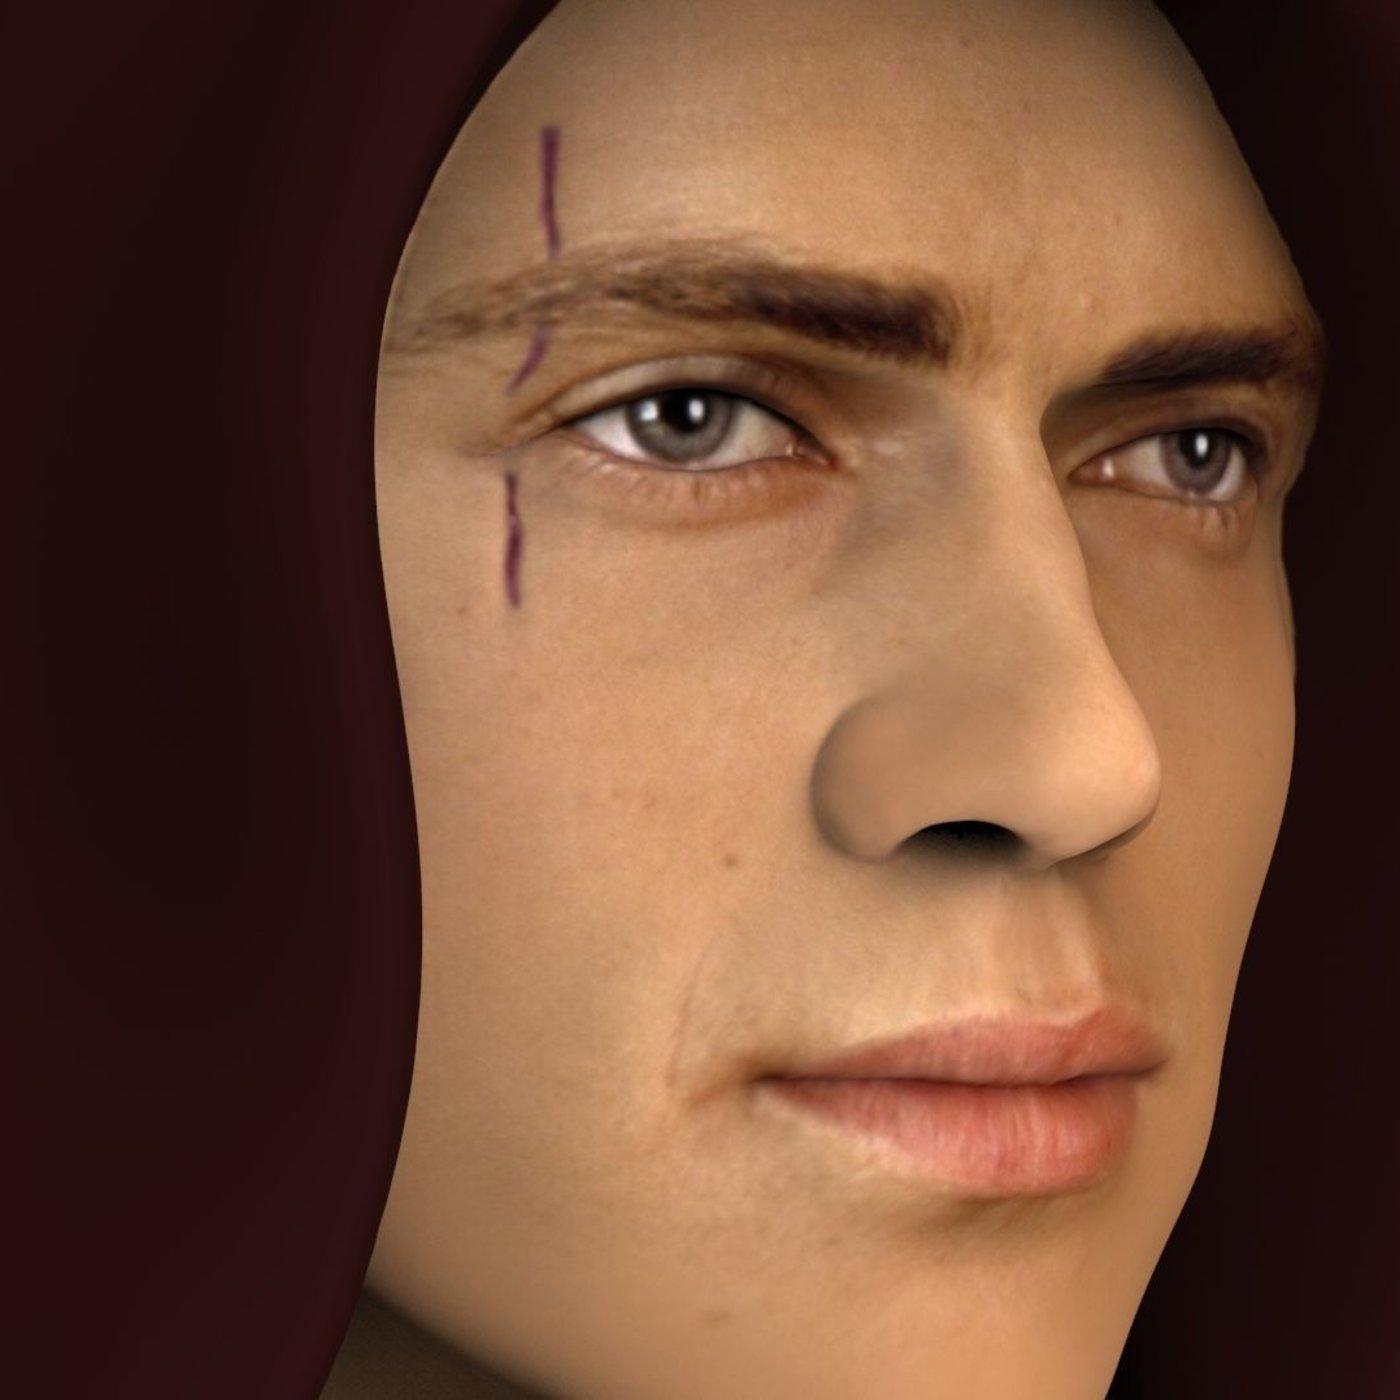 Anakin Skywalker bust